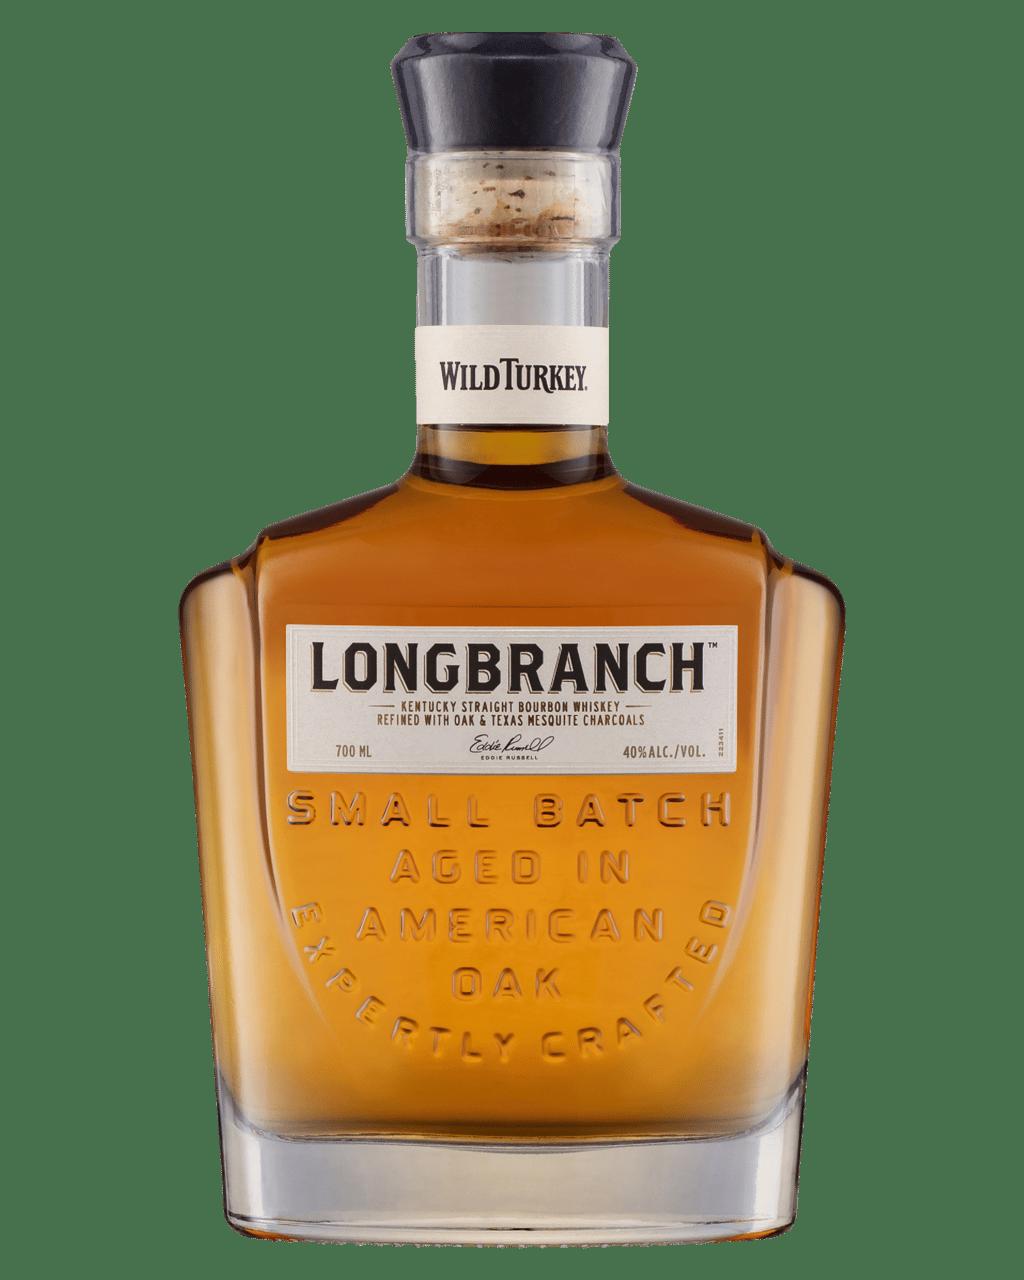 Wild Turkey Longbranch Kentucky Straight Bourbon Whiskey 700ml Dan Swanson Premium Full Spectrum Green Coffee Bean 60 Caps Murphys Buy Wine Champagne Beer Spirits Online